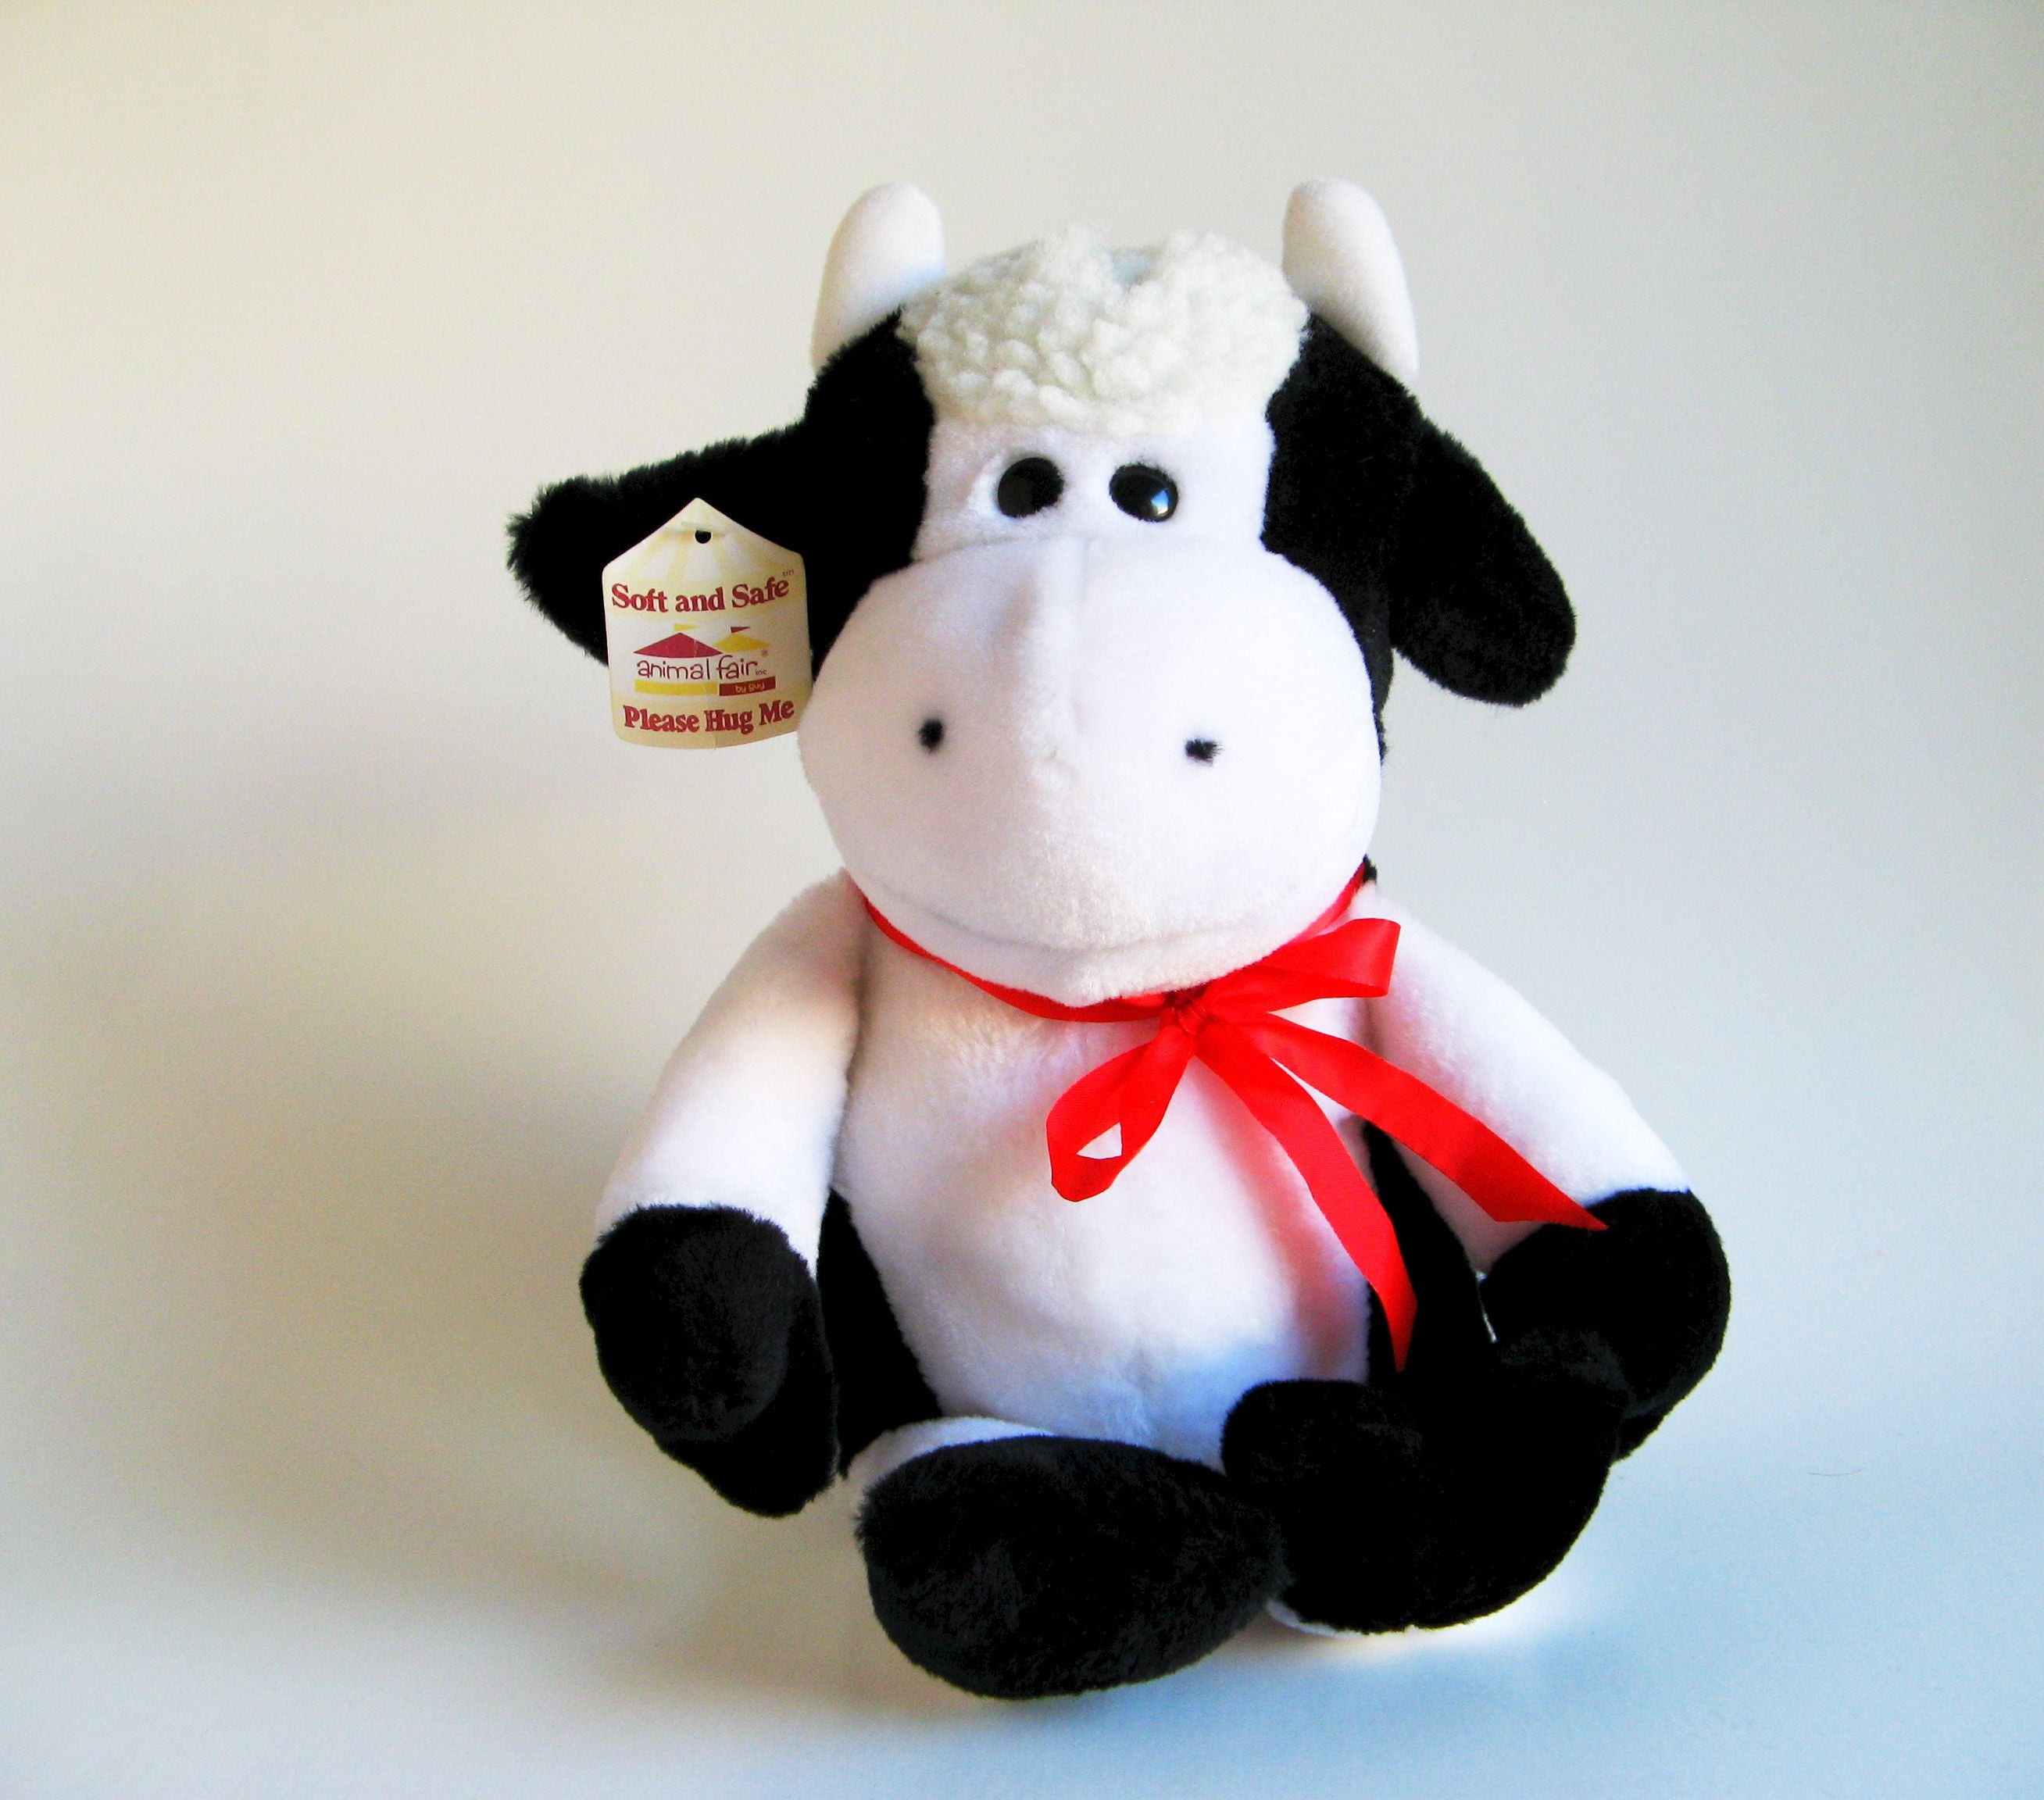 Vintage Cow Bull Stuffed Animal By Animal Fair Kids Toy 1980s Etsy